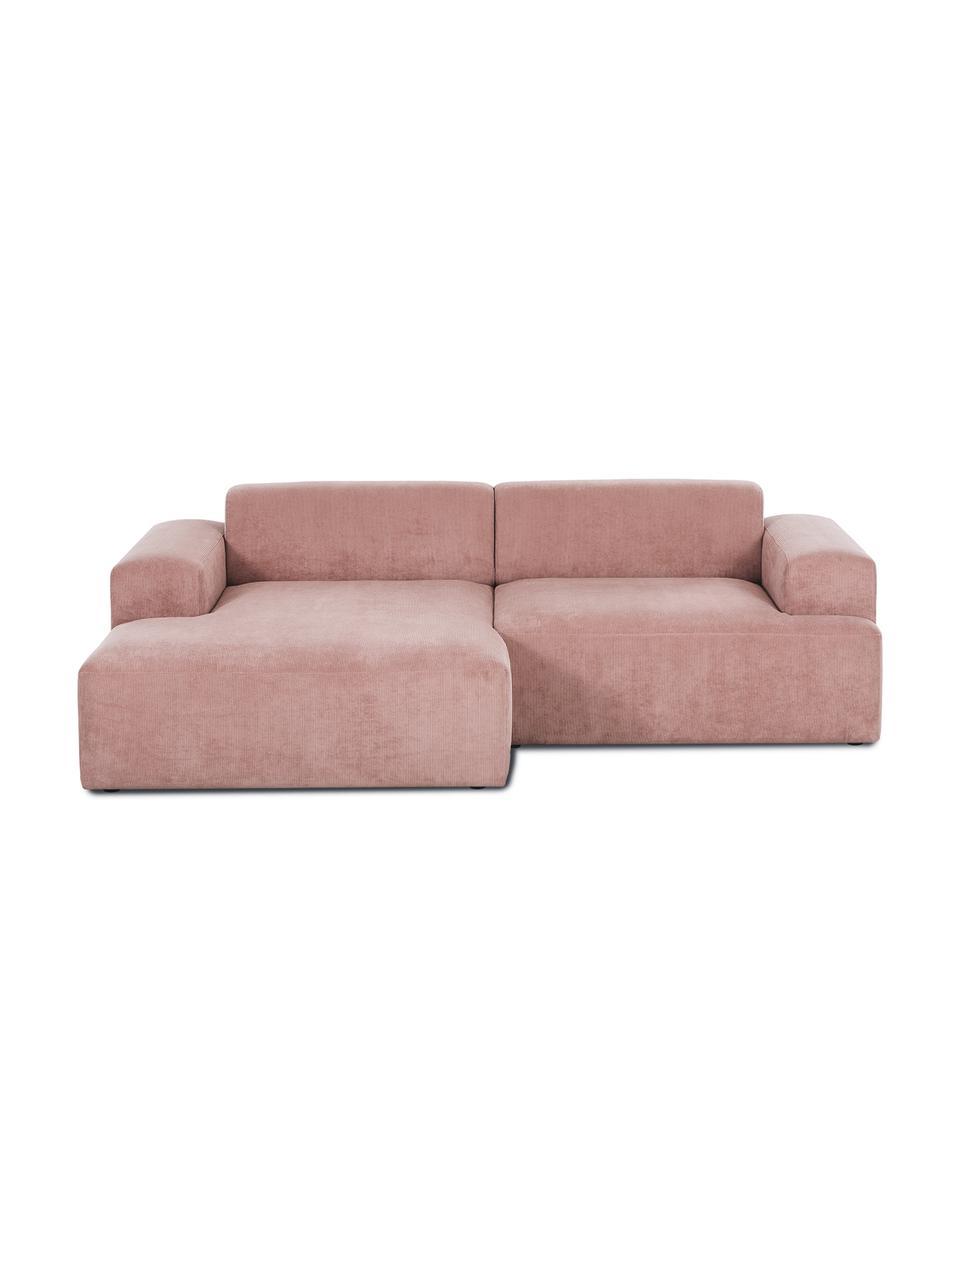 Cord-Ecksofa Melva (3-Sitzer) in Rosa, Bezug: Cord (92% Polyester, 8% P, Gestell: Massives Kiefernholz, Spa, Füße: Kiefernholz, Cord Rosa, B 240 x T 144 cm